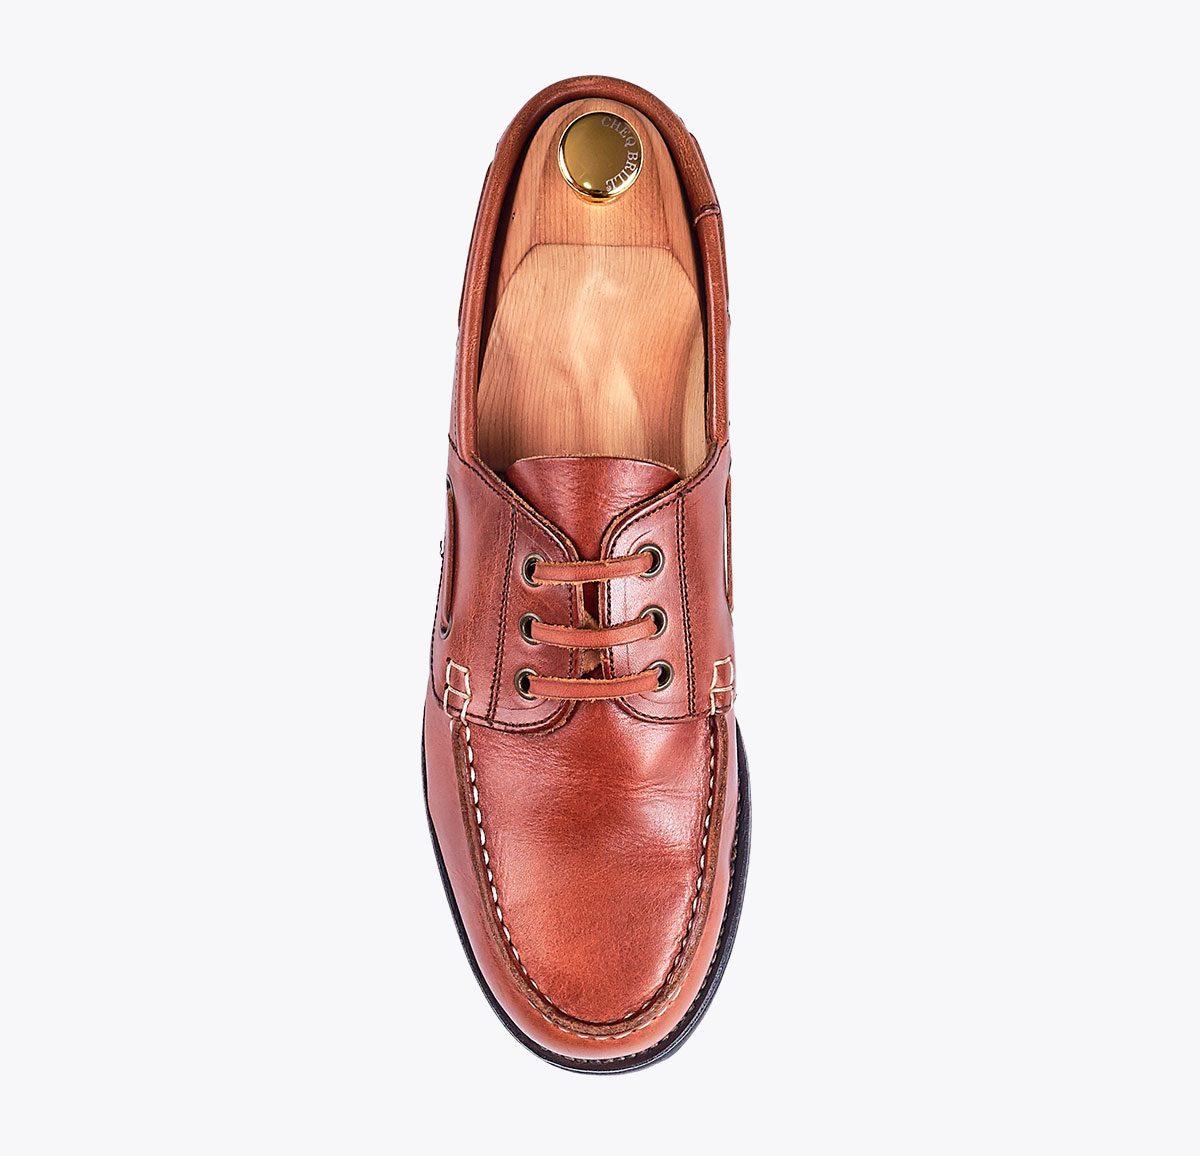 Zapato náutico hecho a mano en mandalashoes, Santanyí Mallorca. Hand made shoes. Nach Mass Schuhe